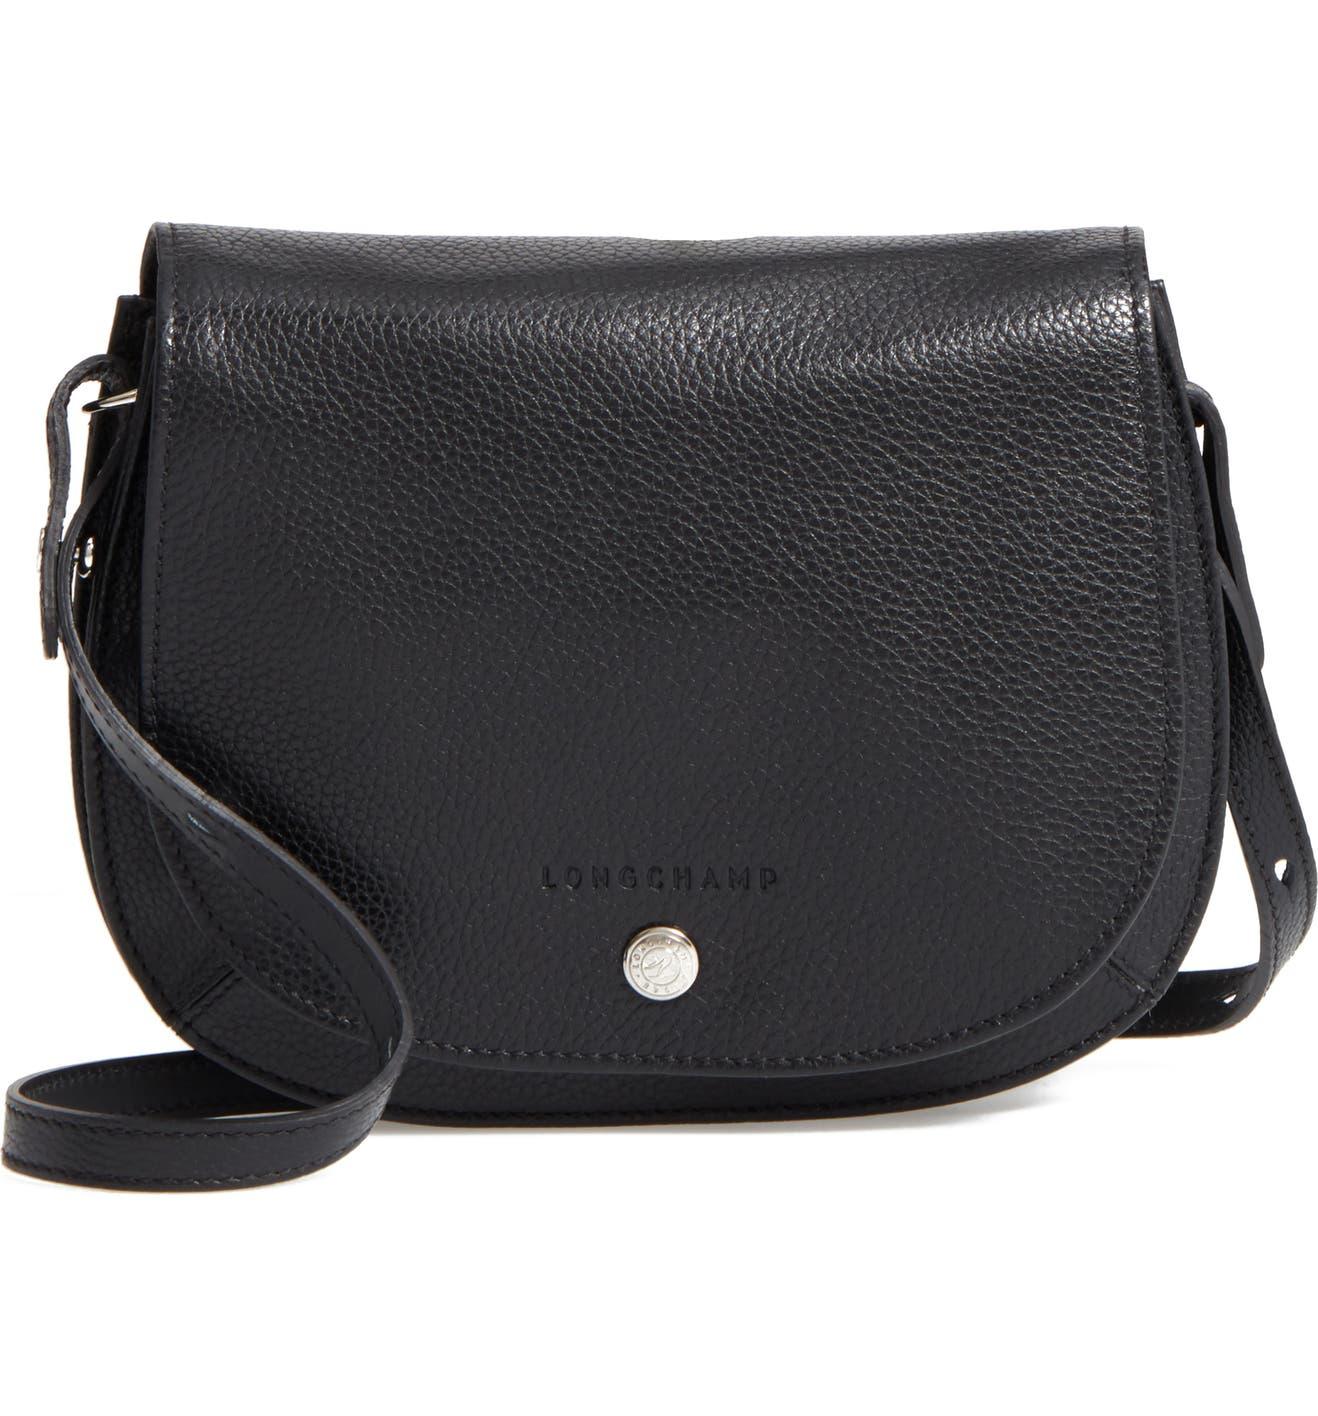 Longchamp Small Le Foulonne Leather Crossbody Bag   Nordstrom 45a5168d6d